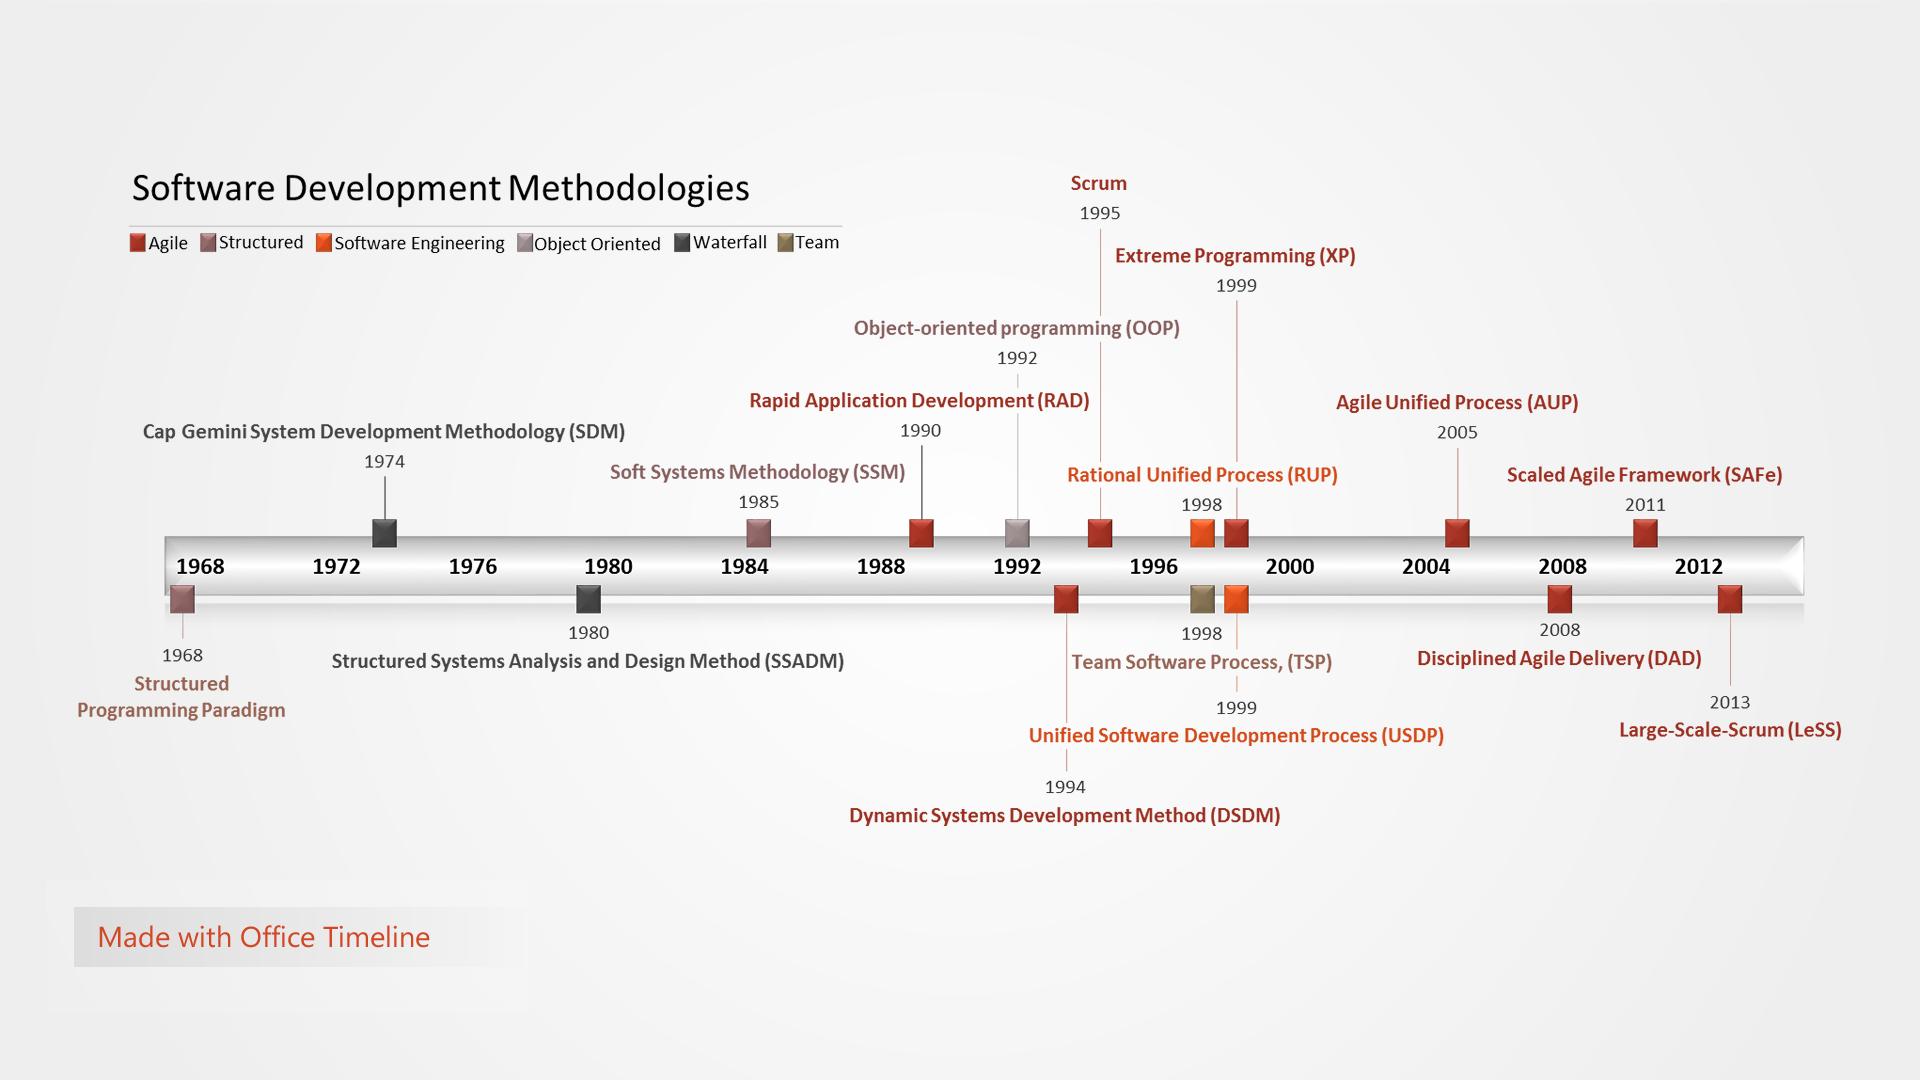 software development methodologies timeline